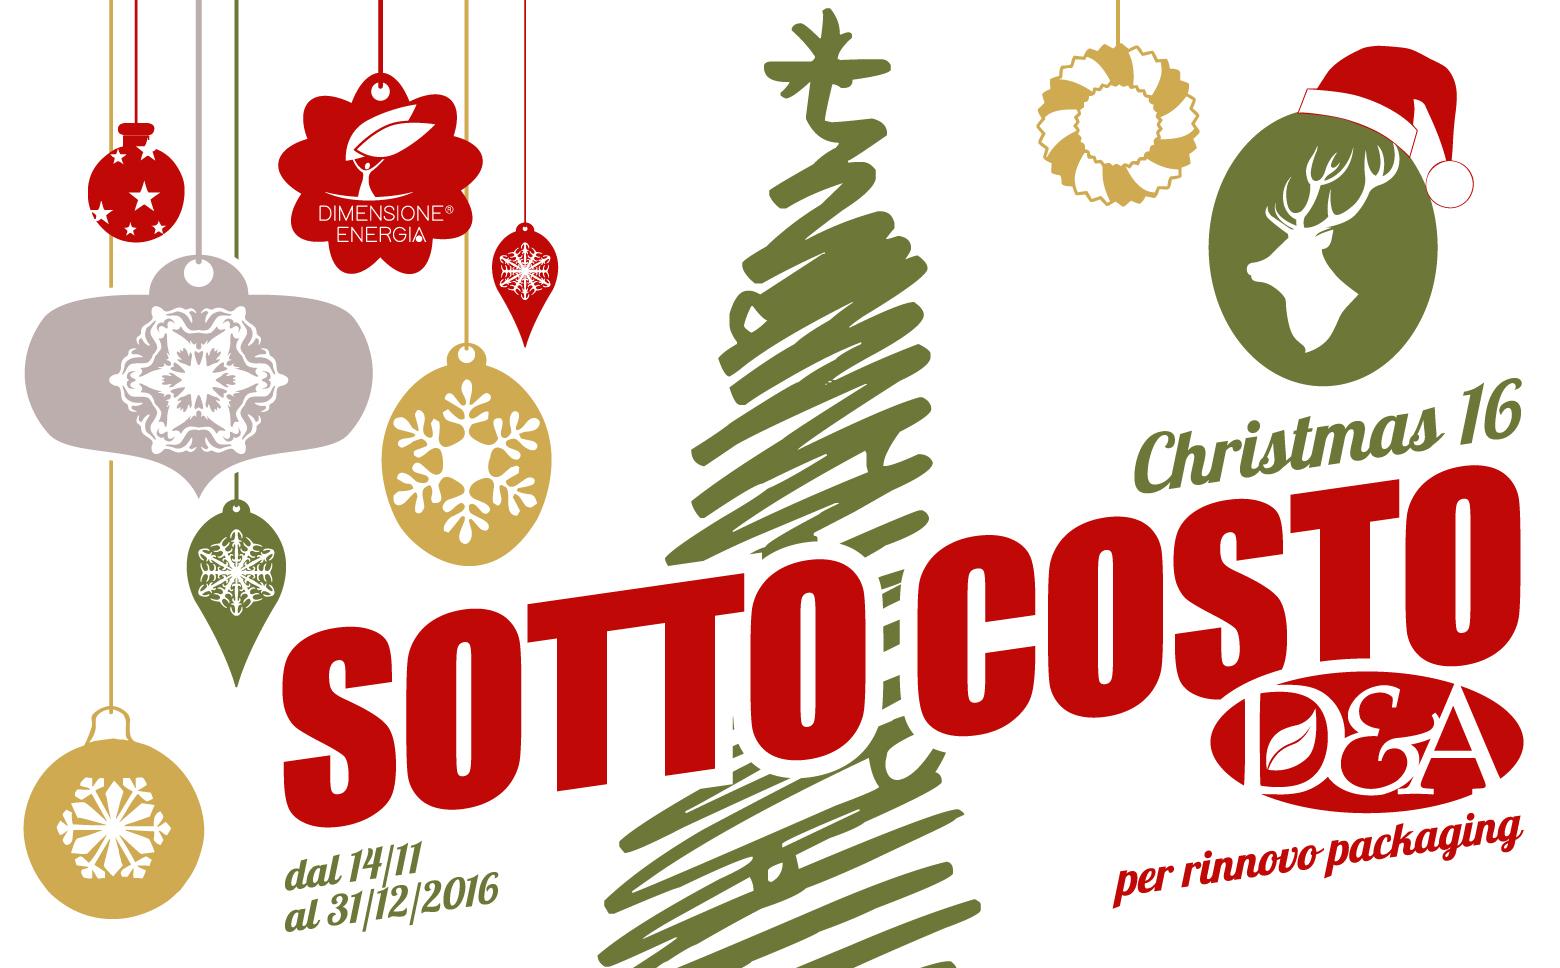 promozioni-natalizie-2016-mail